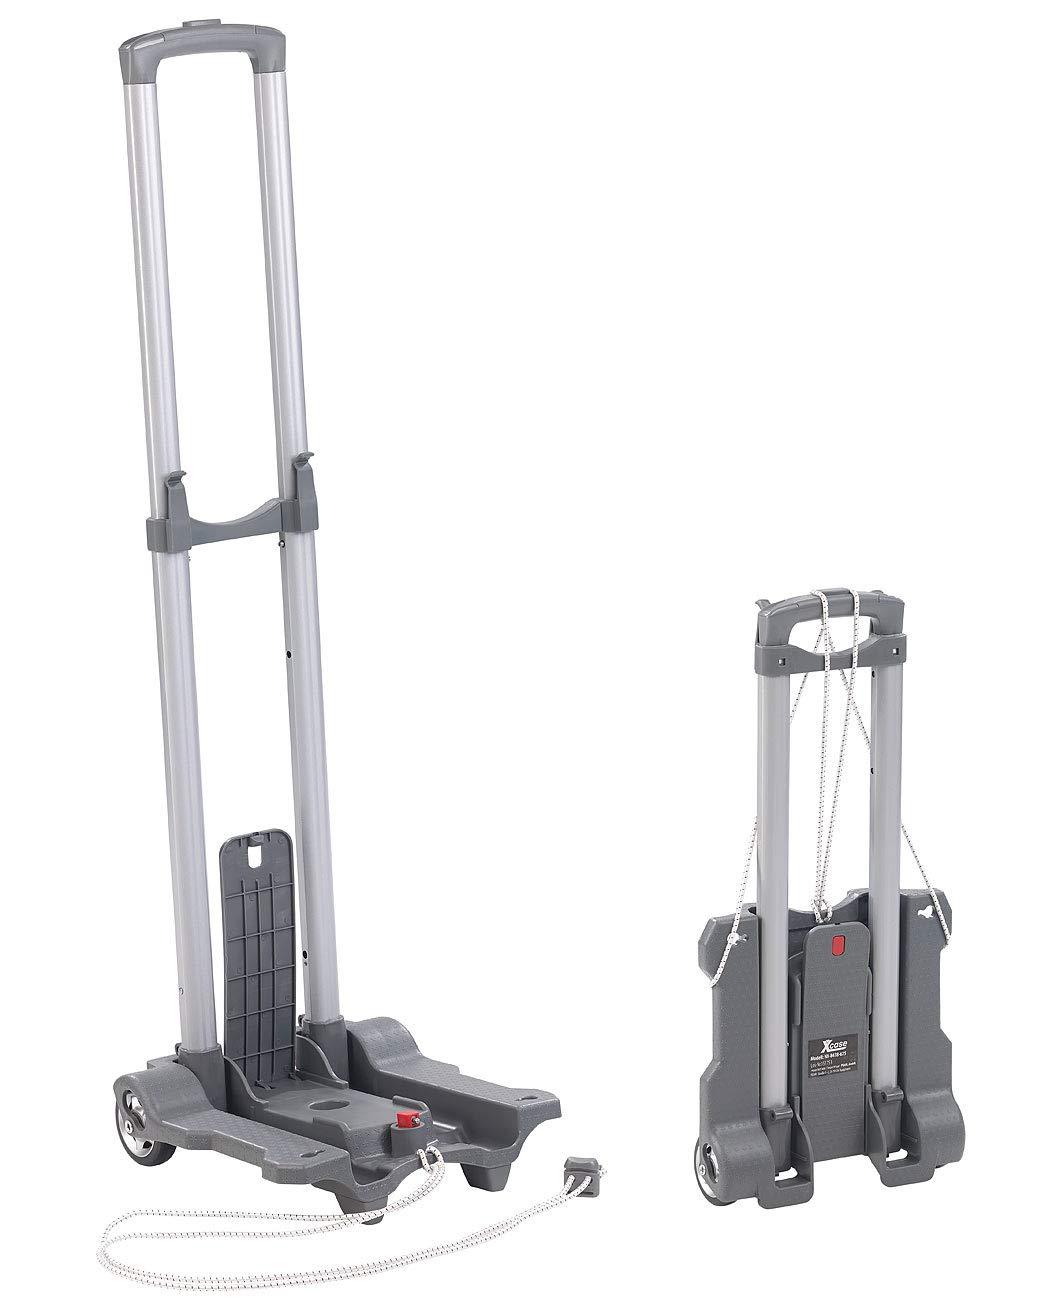 Xcase Transportkarre: Ultra-kompakte Falt-Sackkarre mit Nylon-Rädern, bis 45 kg belastbar (Karre)